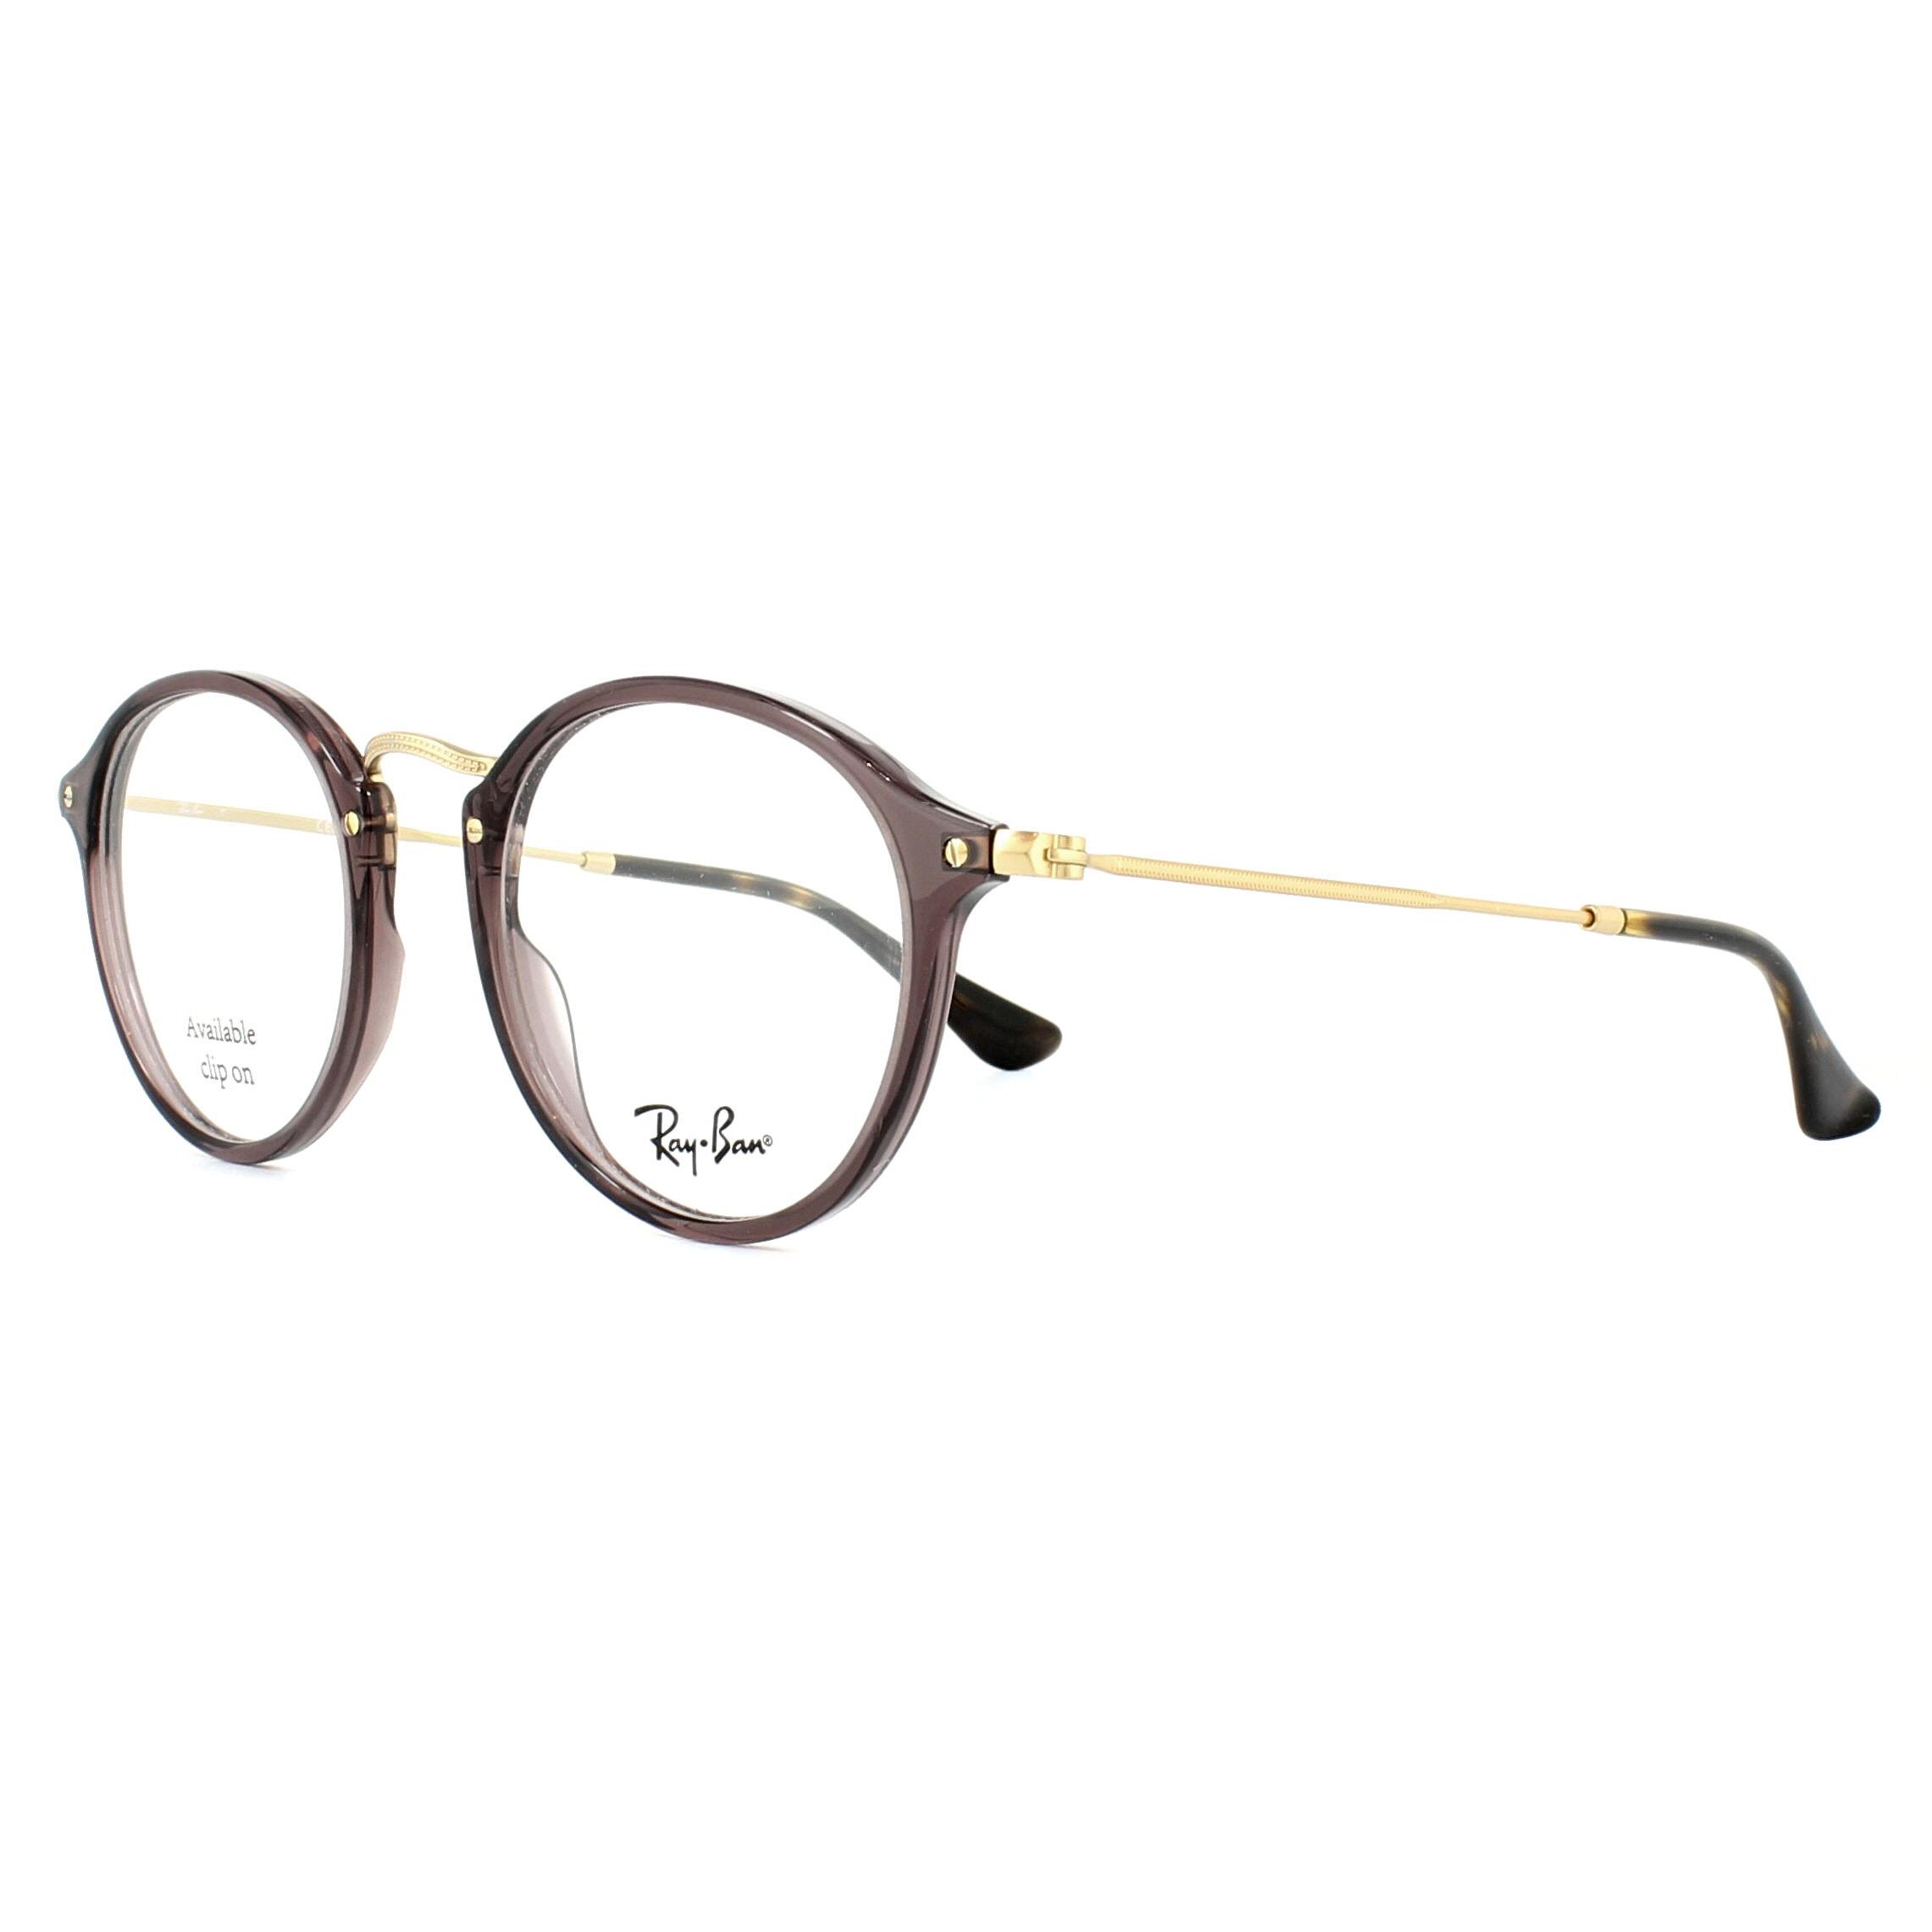 Sentinel Ray-Ban Glasses Frames 2447V 8032 Opal Brown Tortoise 47mm Mens 7abb69e991aa